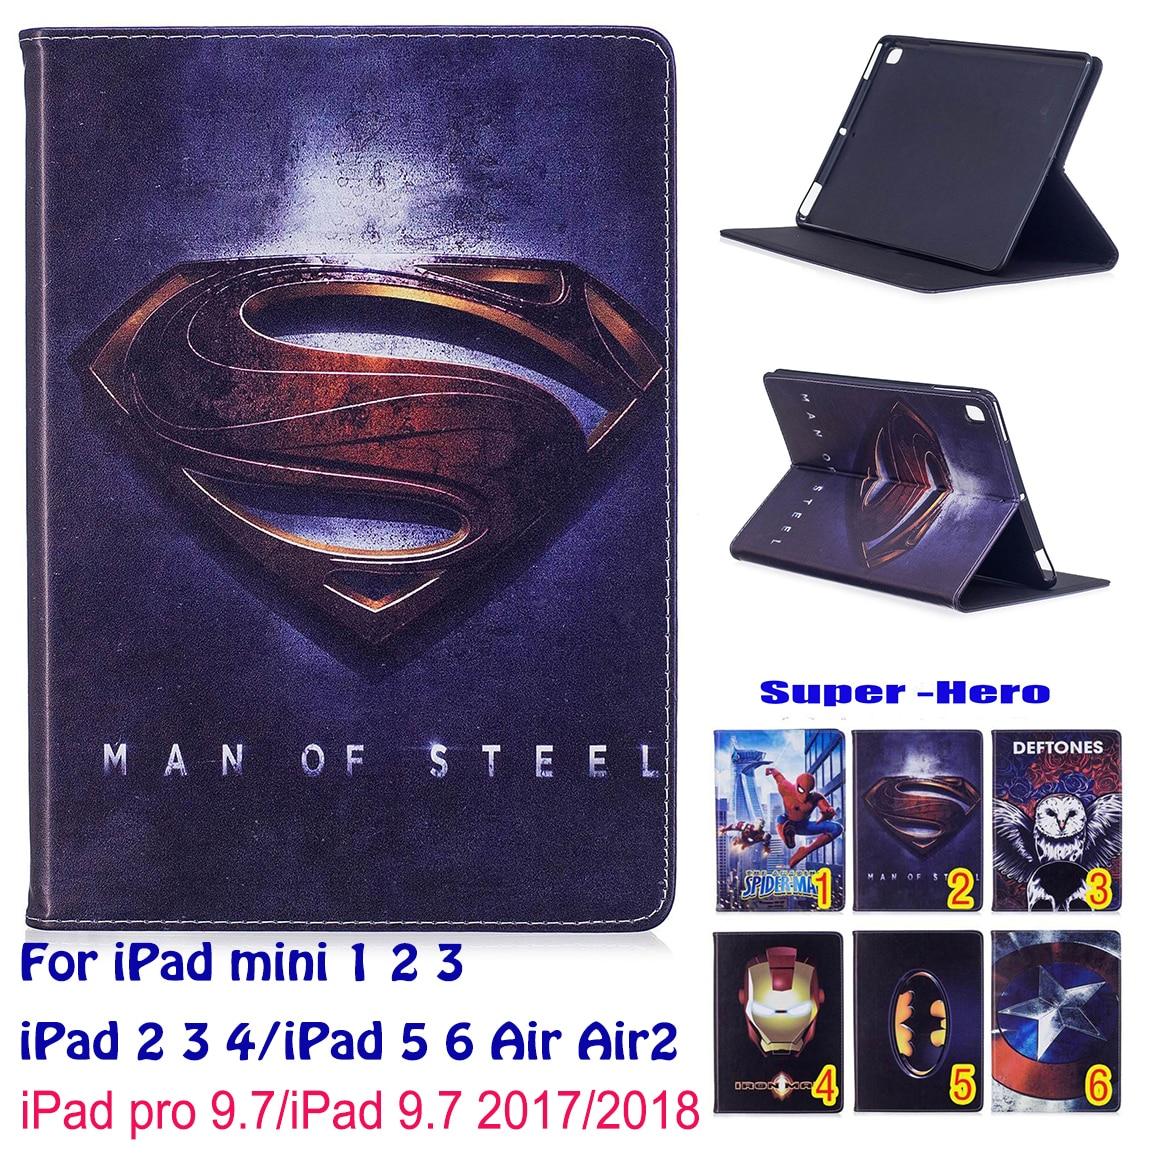 Spiderman Superman Pattern Case For Apple iPad mini 1 2 3 iPad 5 6 Air Air2 iPad 9.7 2017 2018 iPad 4 Case Tablet Stand Funda kinston kst91872 ladybug petunia w rhinestones pattern pu case w stand for iphone 6 multicolored